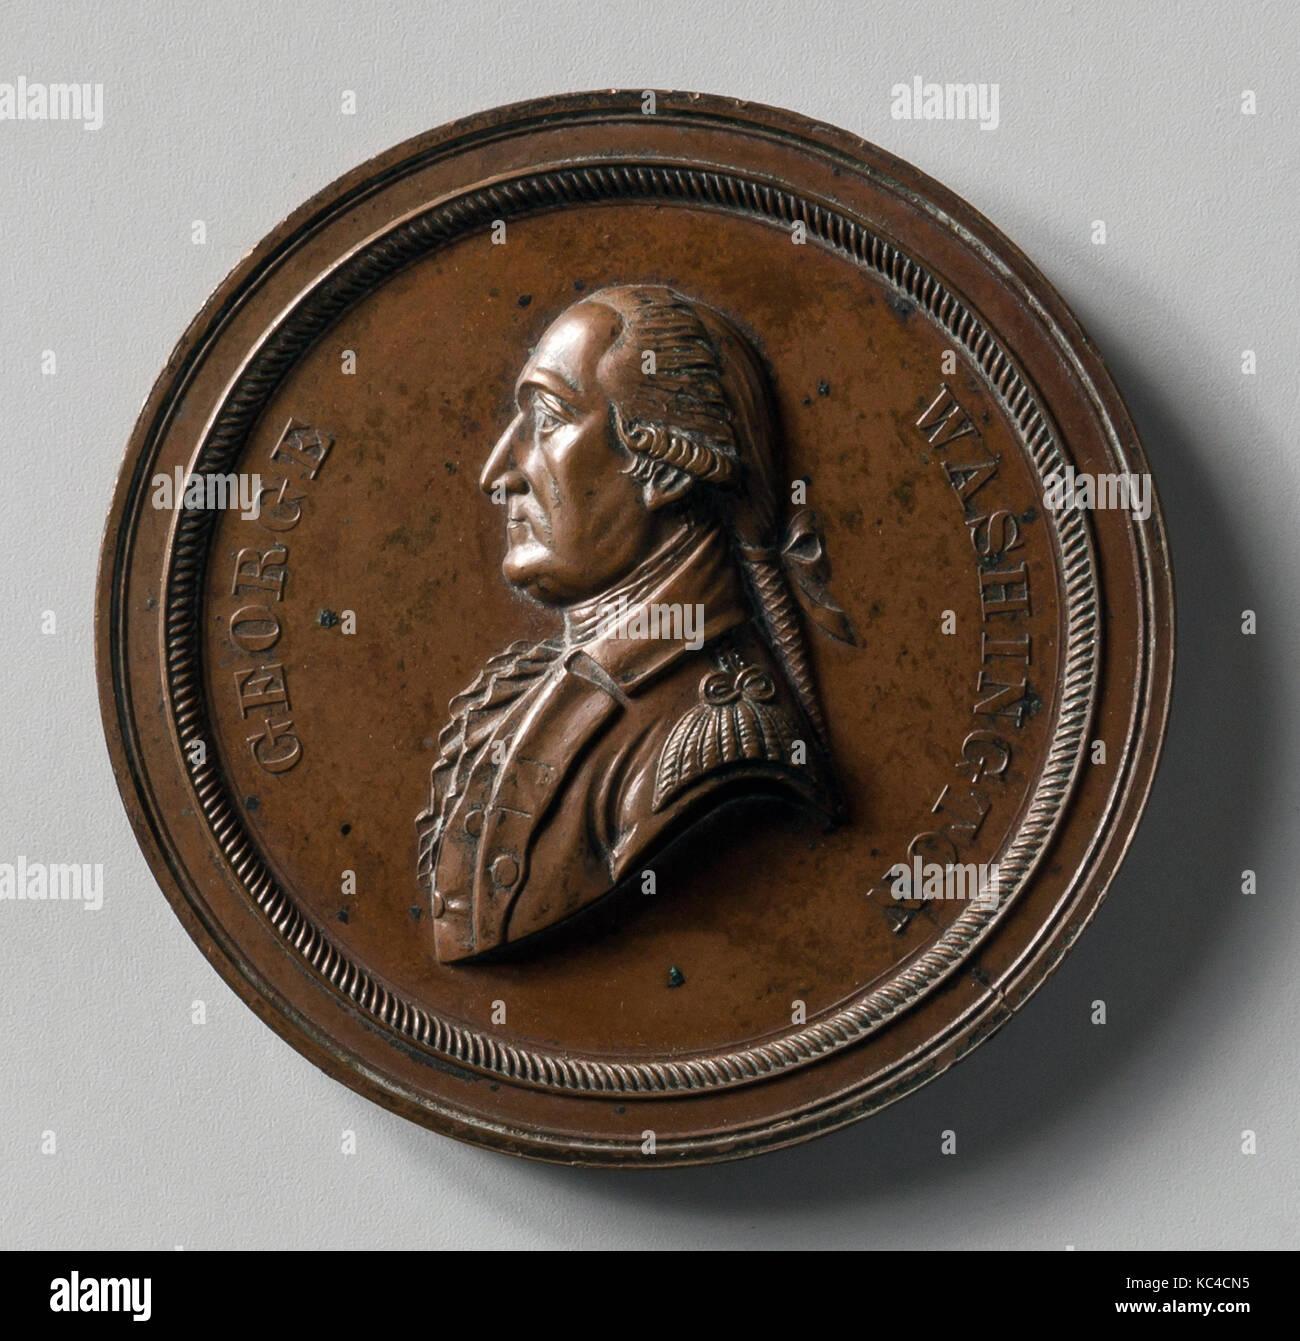 Medalla, 1870-1900, bronce, diam. 2 5/16 in. (5,9 cm), Metal, John A. Bolen (1826-1906 Foto de stock